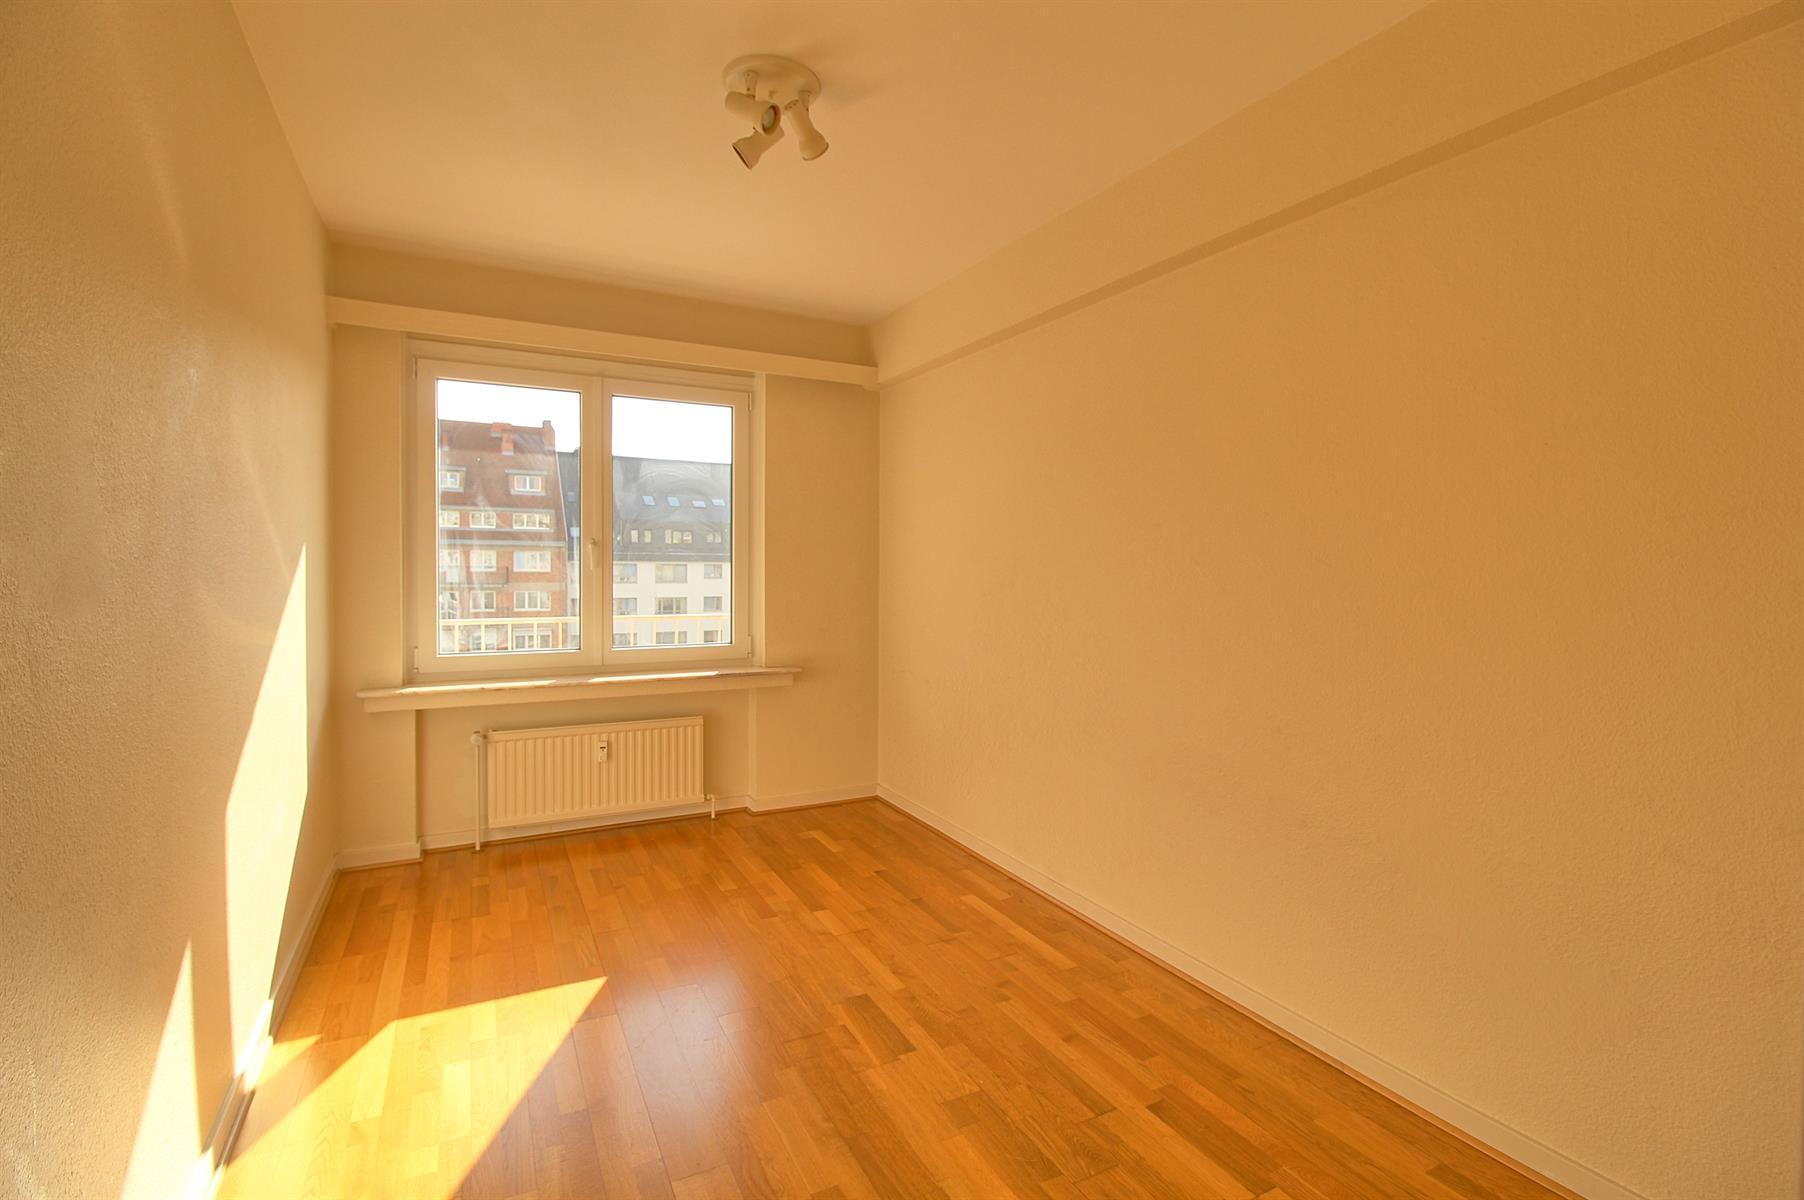 Appartement - Woluwe-Saint-Lambert - #4183448-3